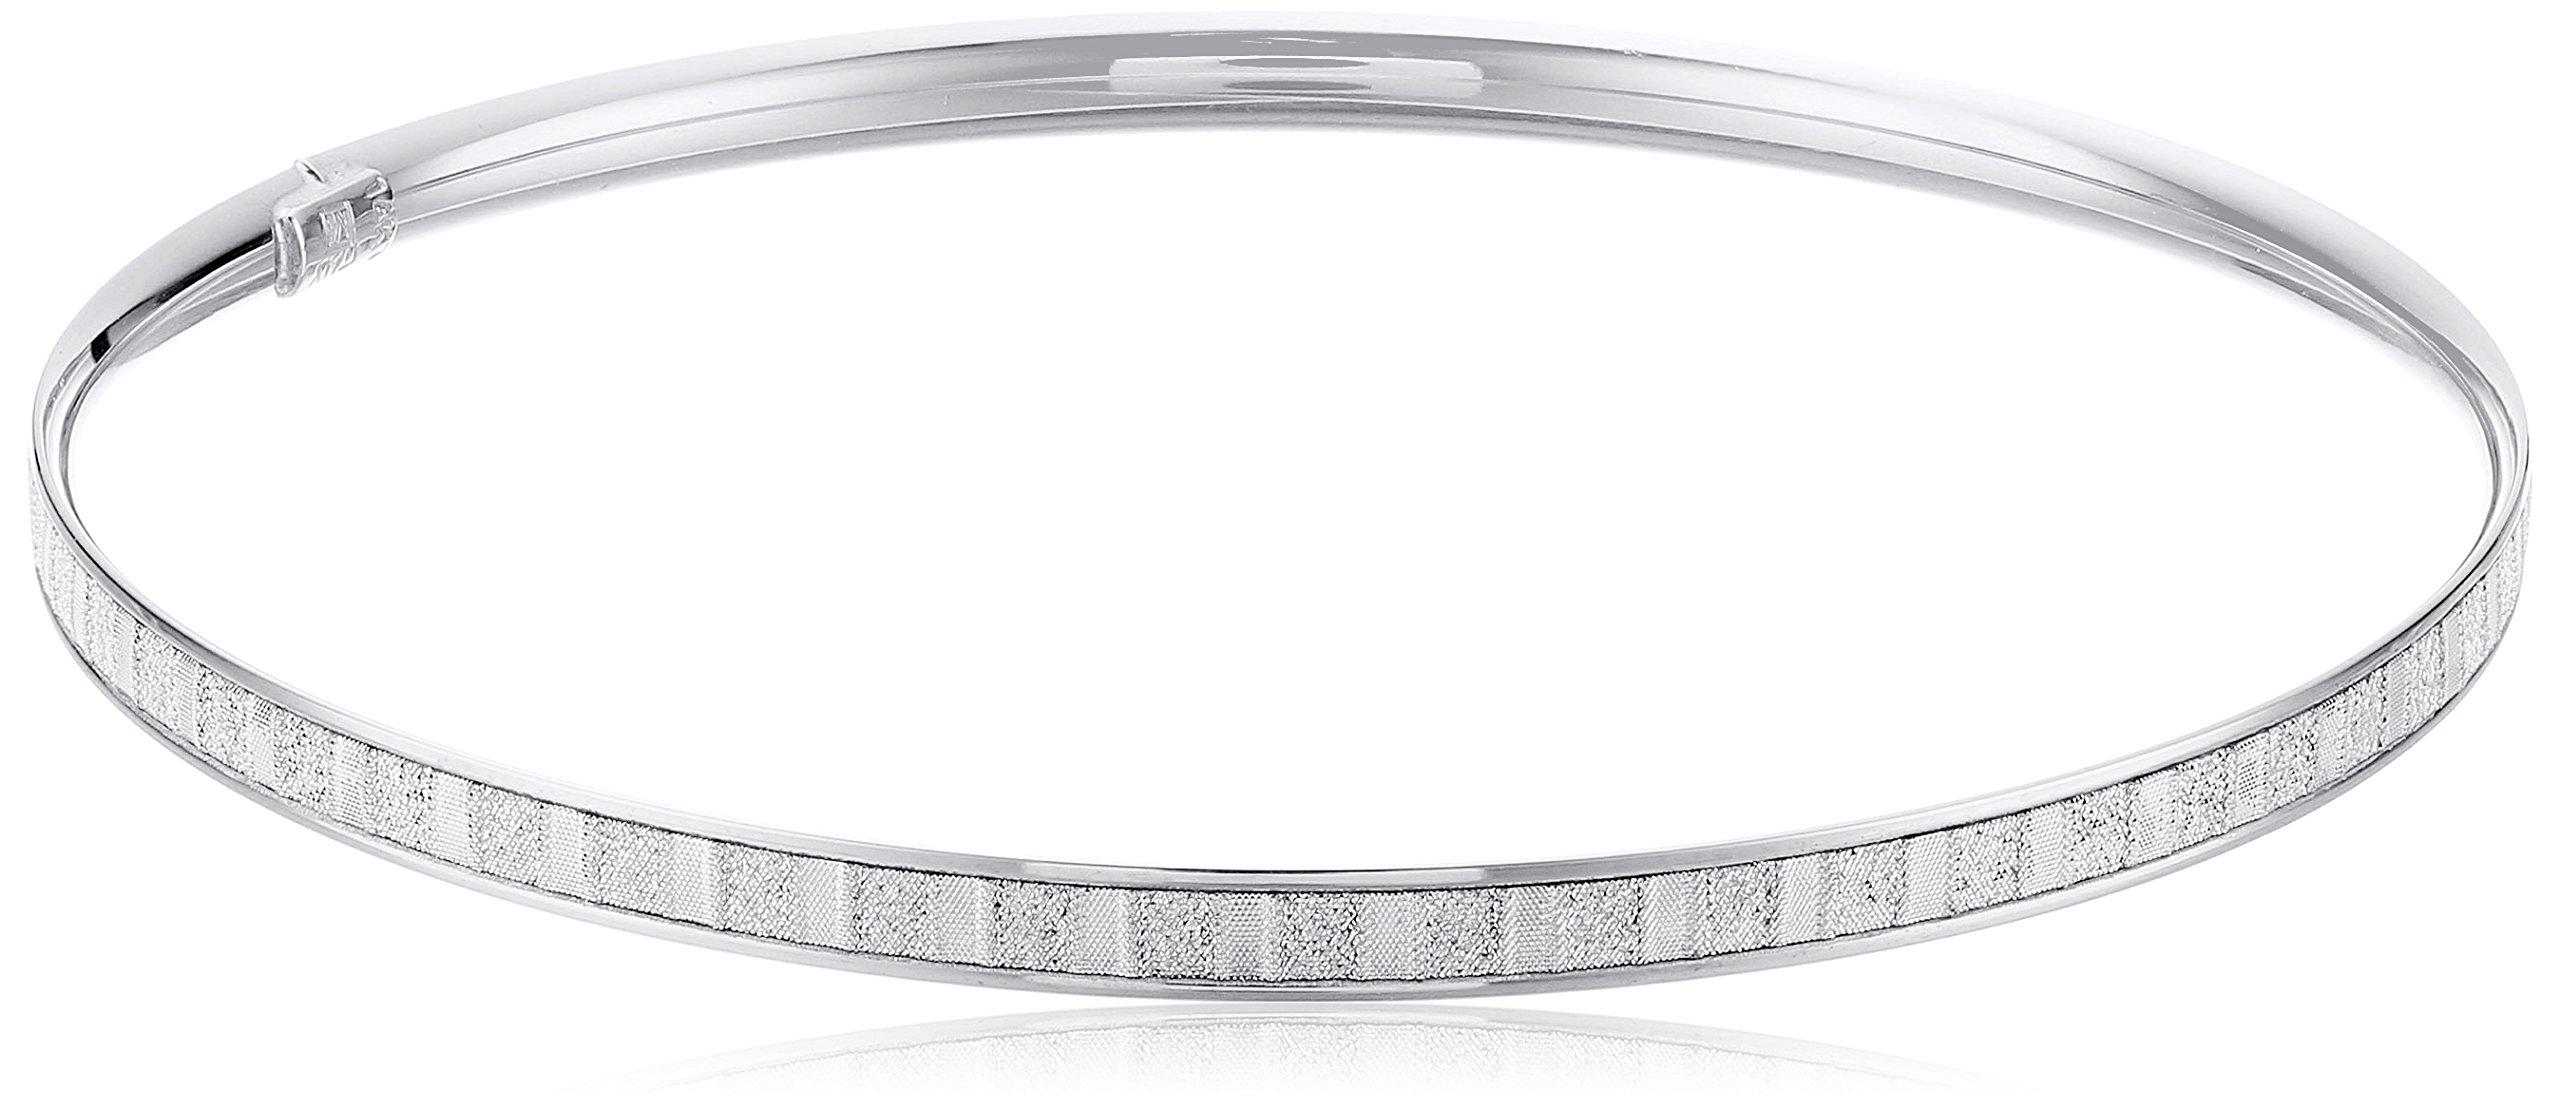 14k White Gold Italian 4 mm Tube Slip On Bangle with Baguette Style Glitter Bangle Bracelet by Amazon Collection